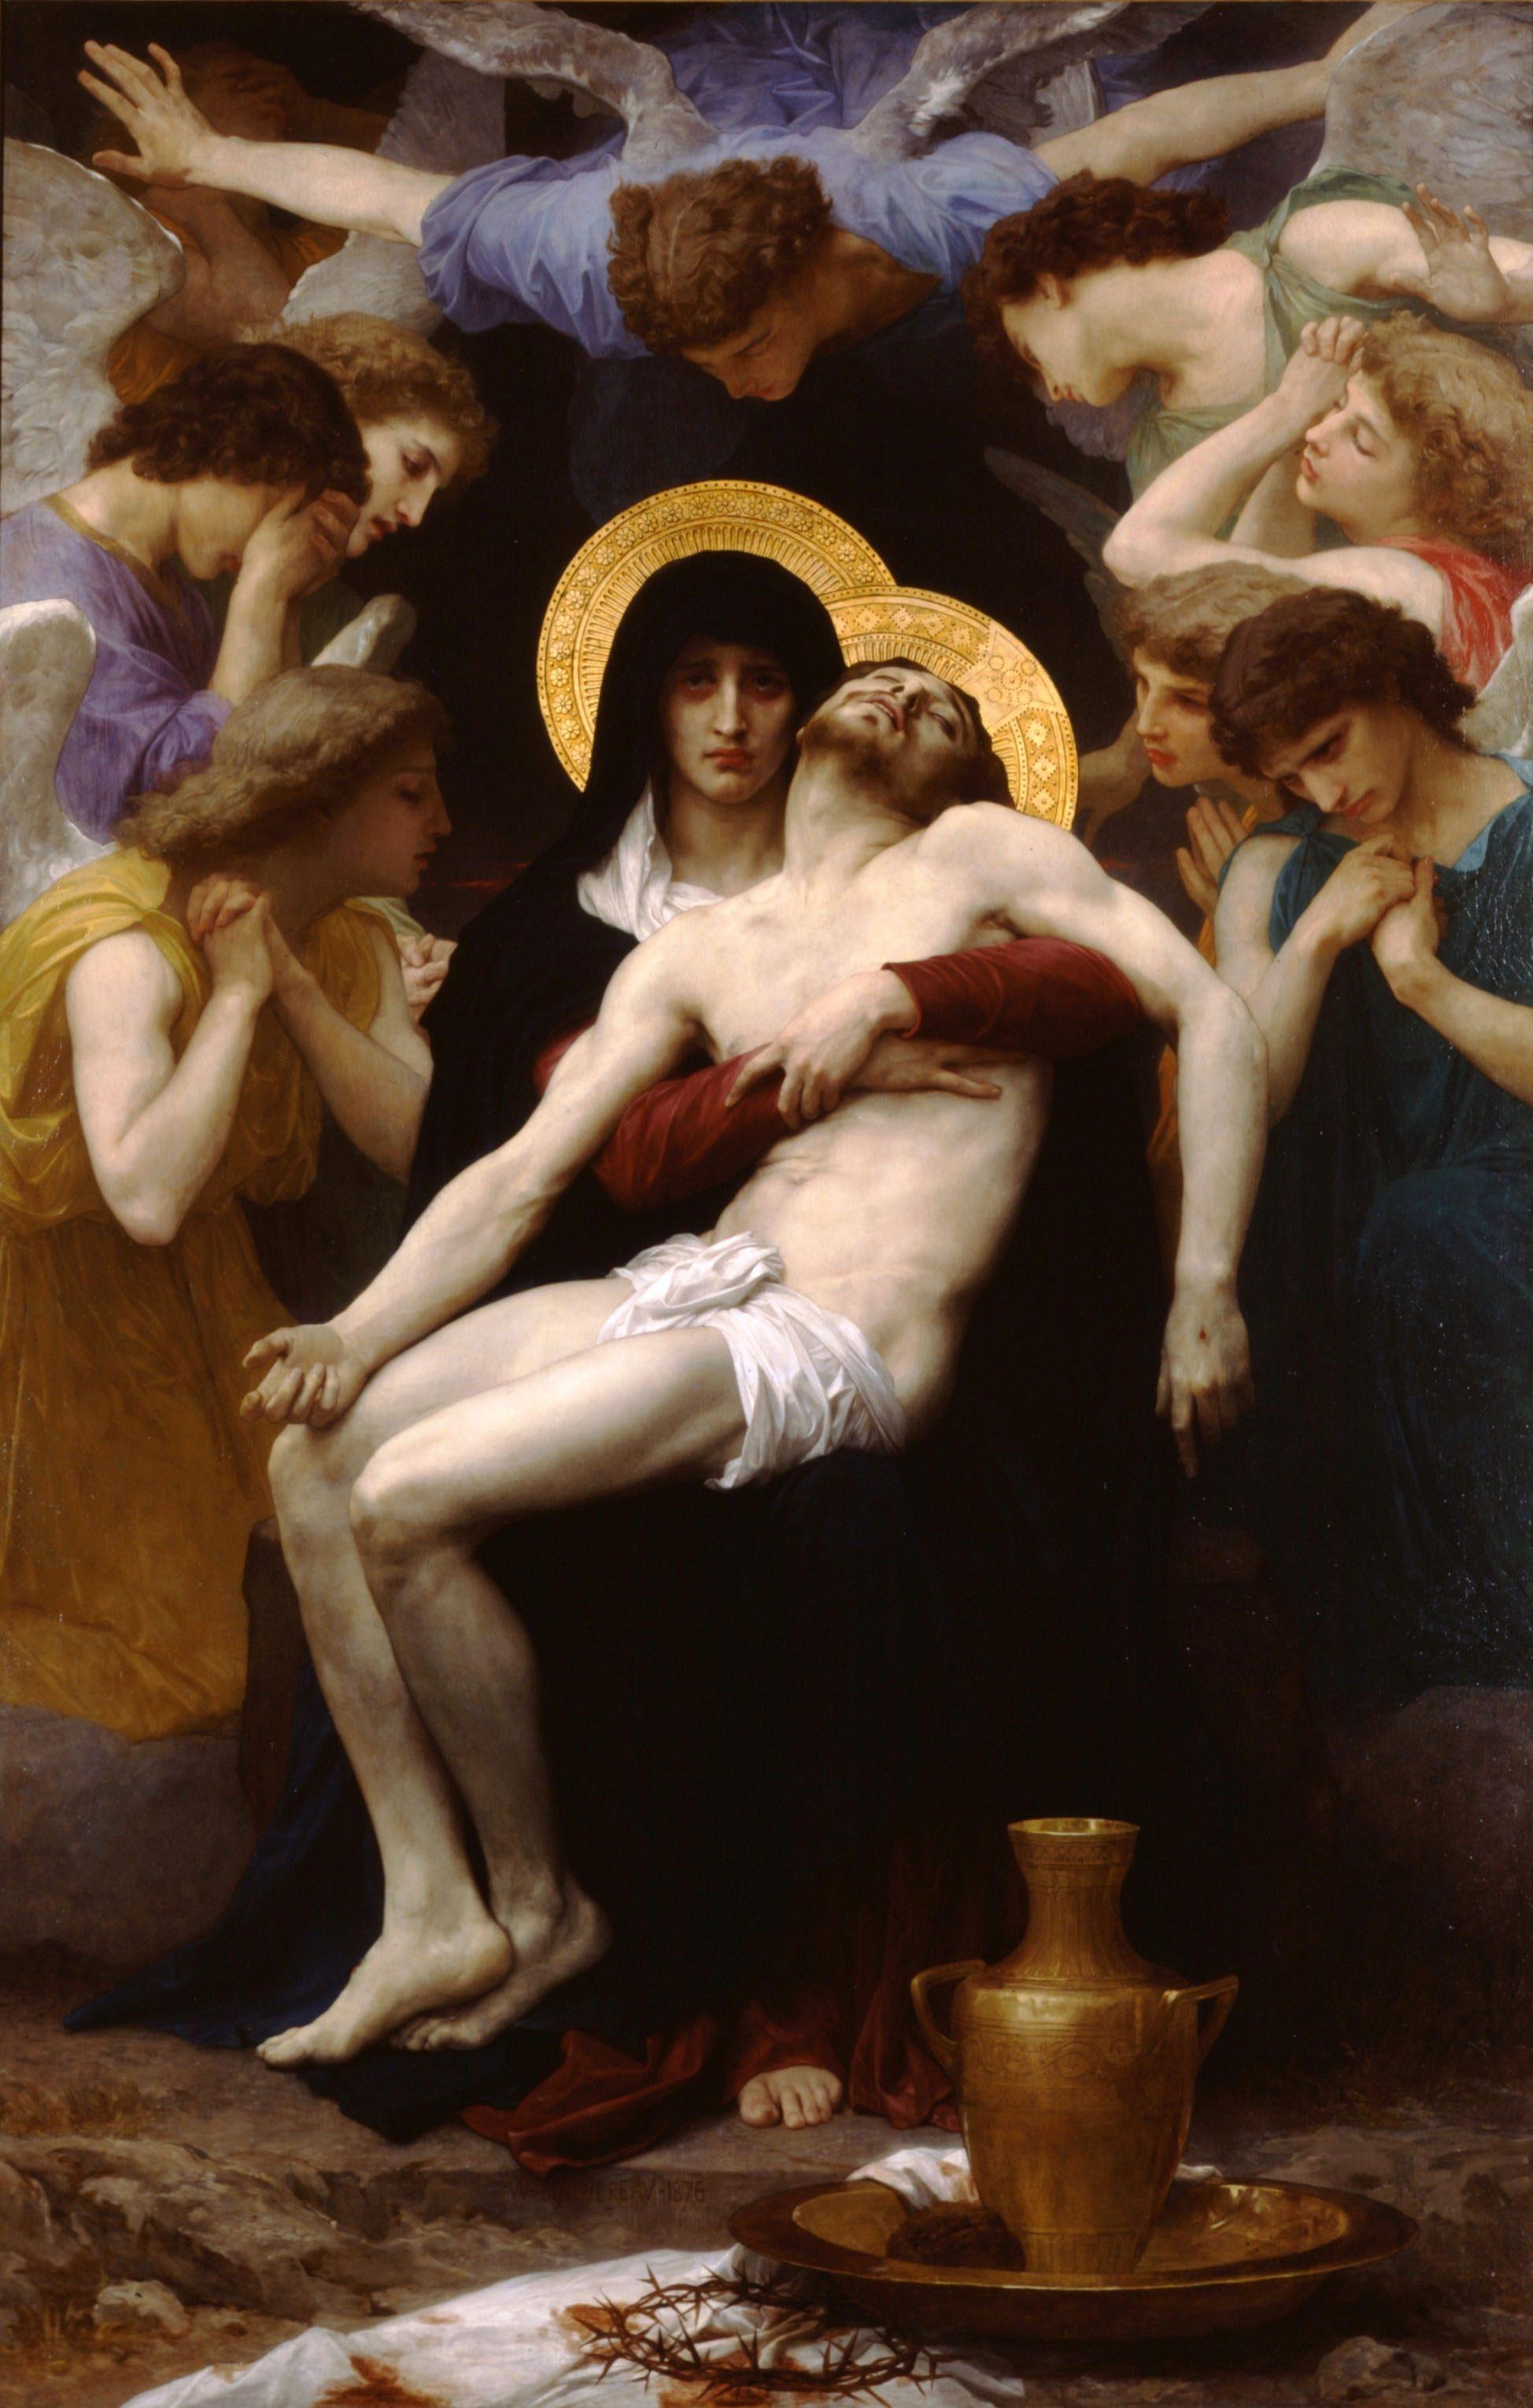 """Pieta"" by William Bouguereau (1876)"